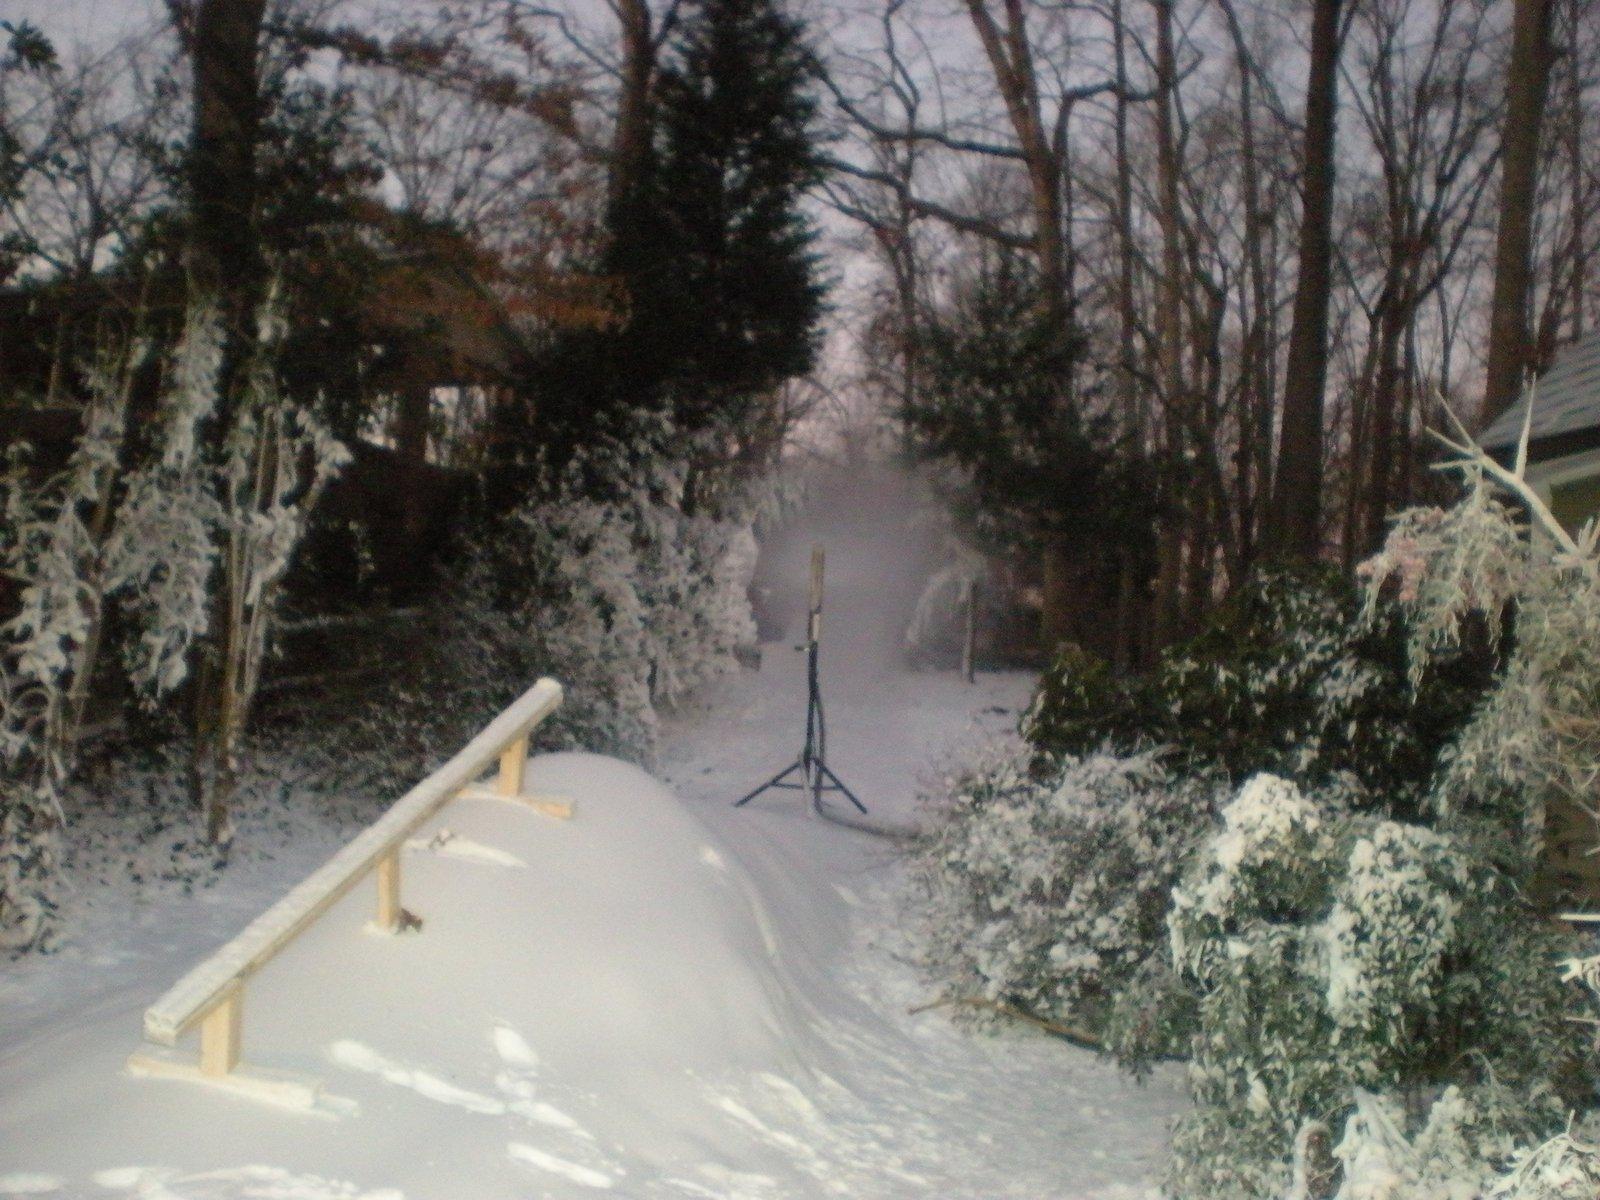 Made snow